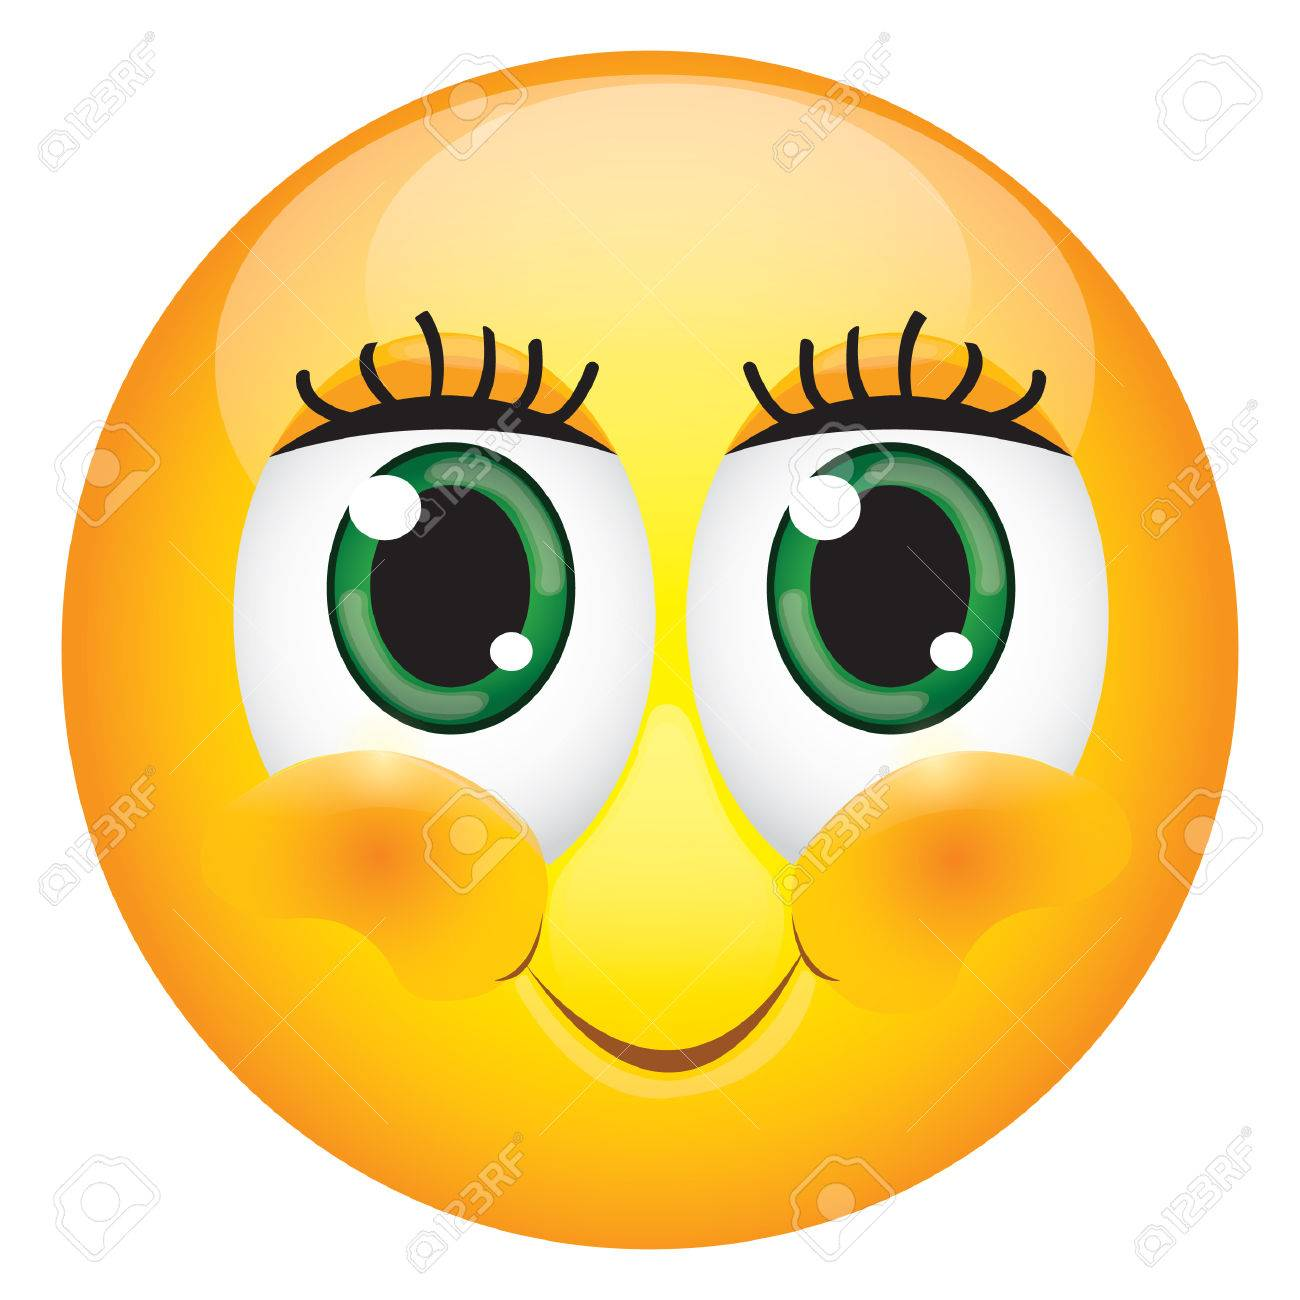 cute eyelashes emoticon royalty free cliparts vectors and stock